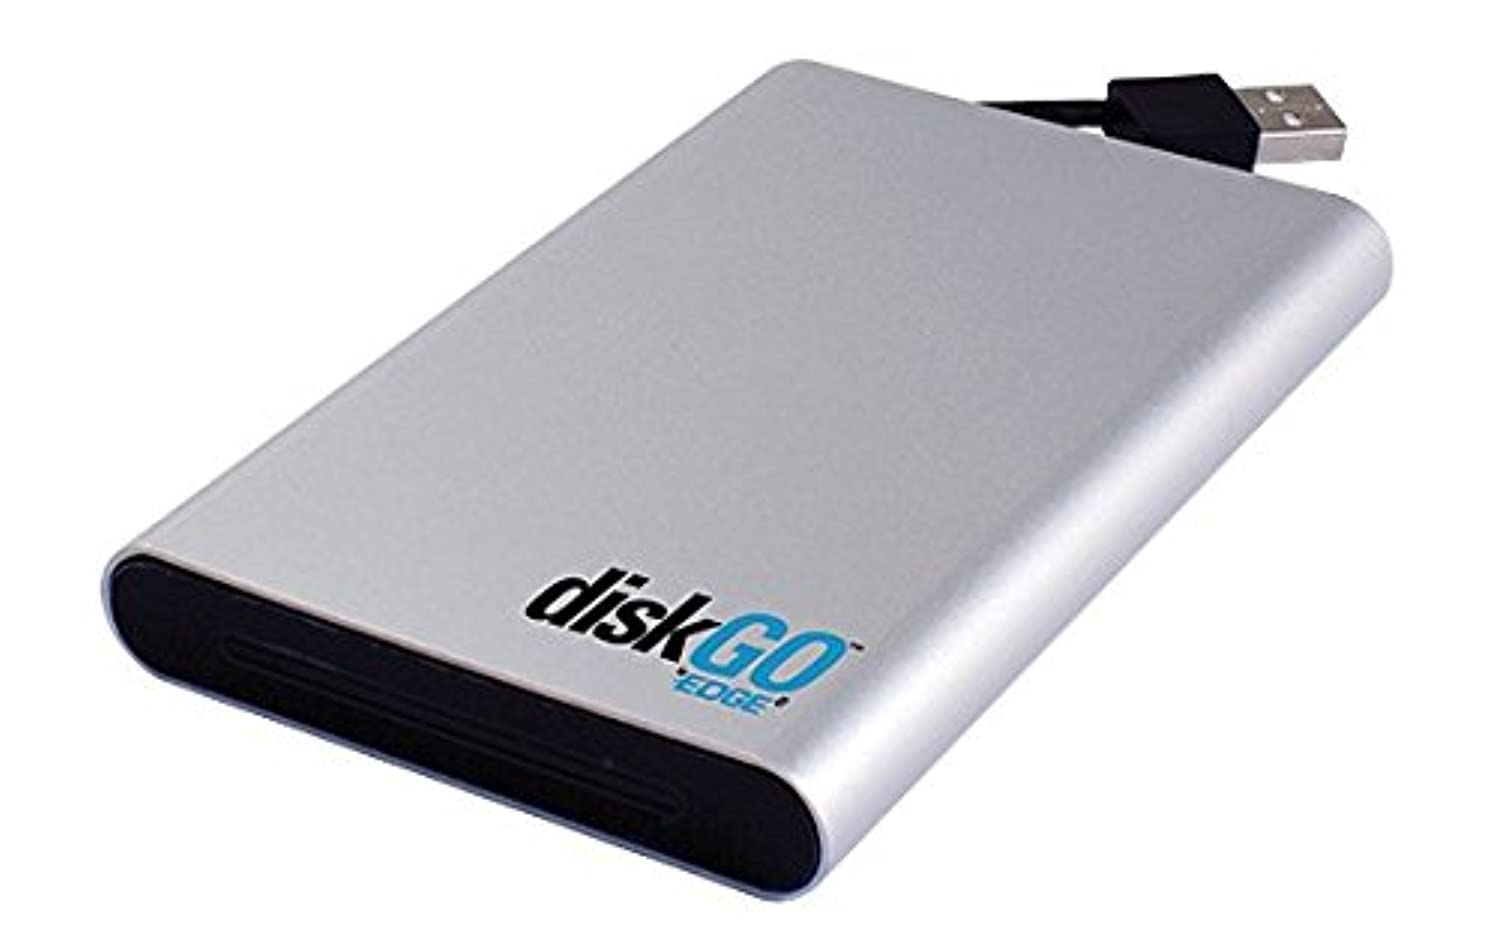 Edge Memory 1tb Diskgo 2.5 Portable USB 2.0 Hard Dr